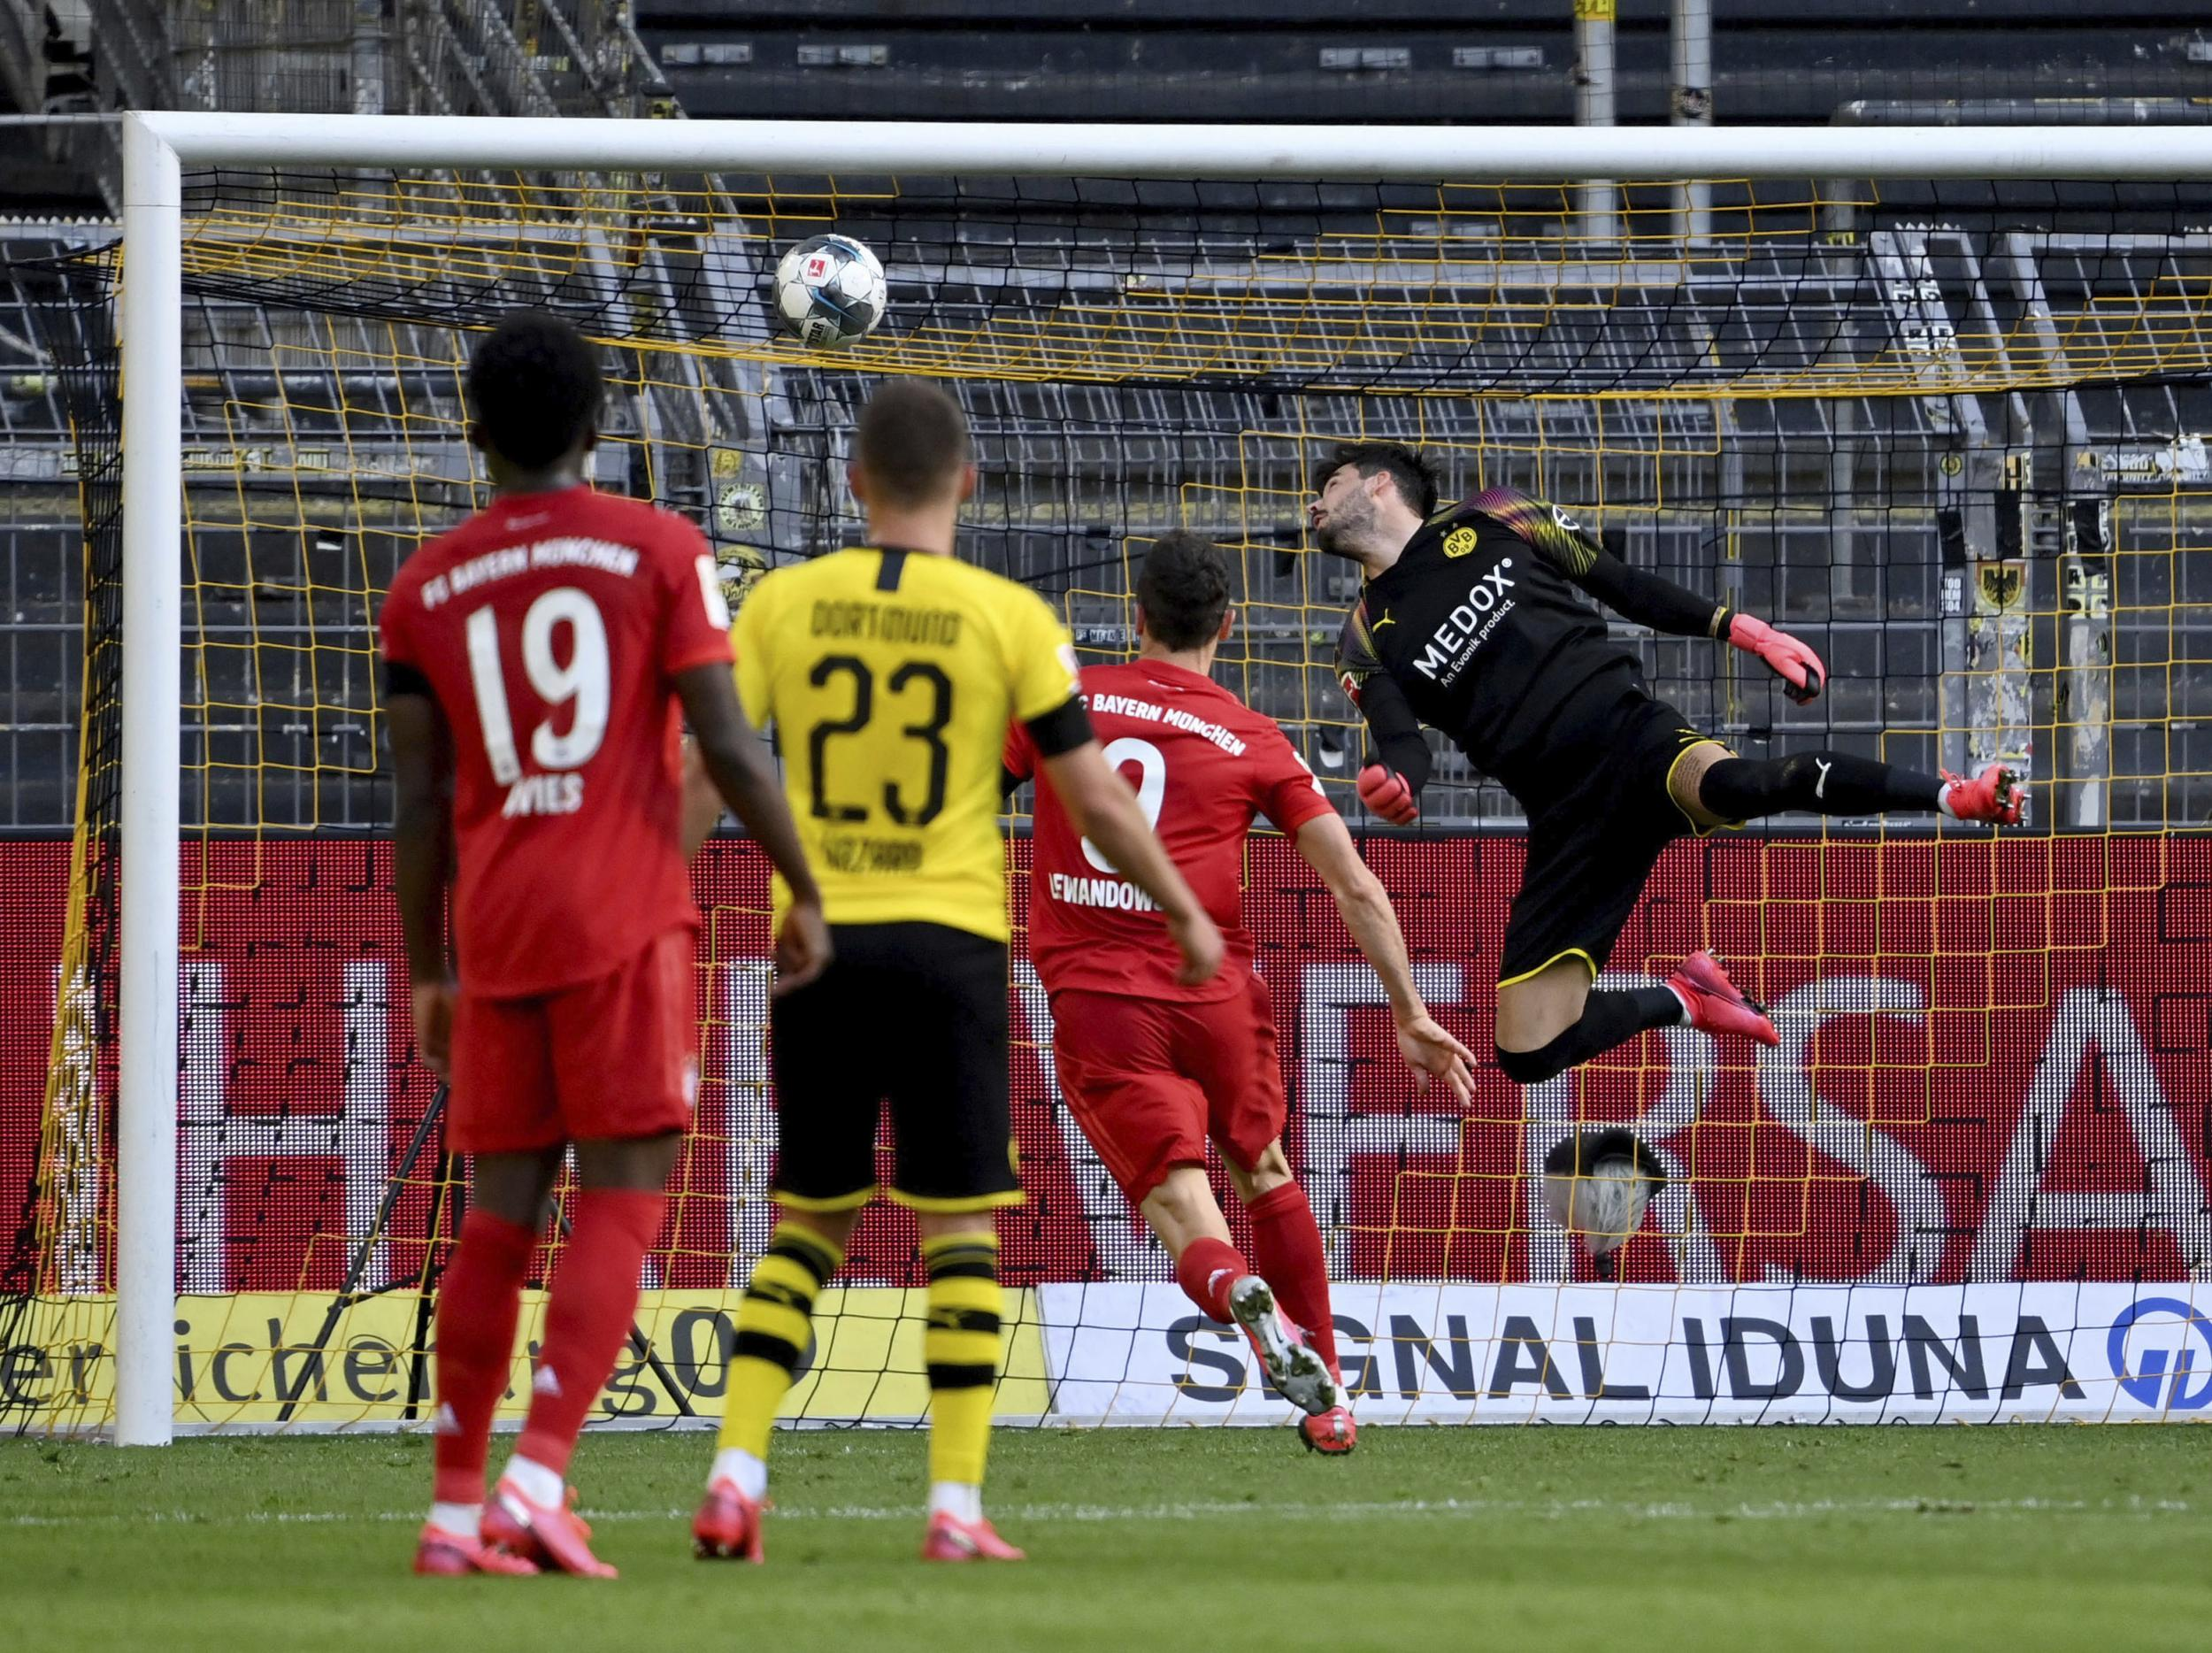 Bayern Munich beat Borussia Dortmund to close in on yet another Bundesliga title